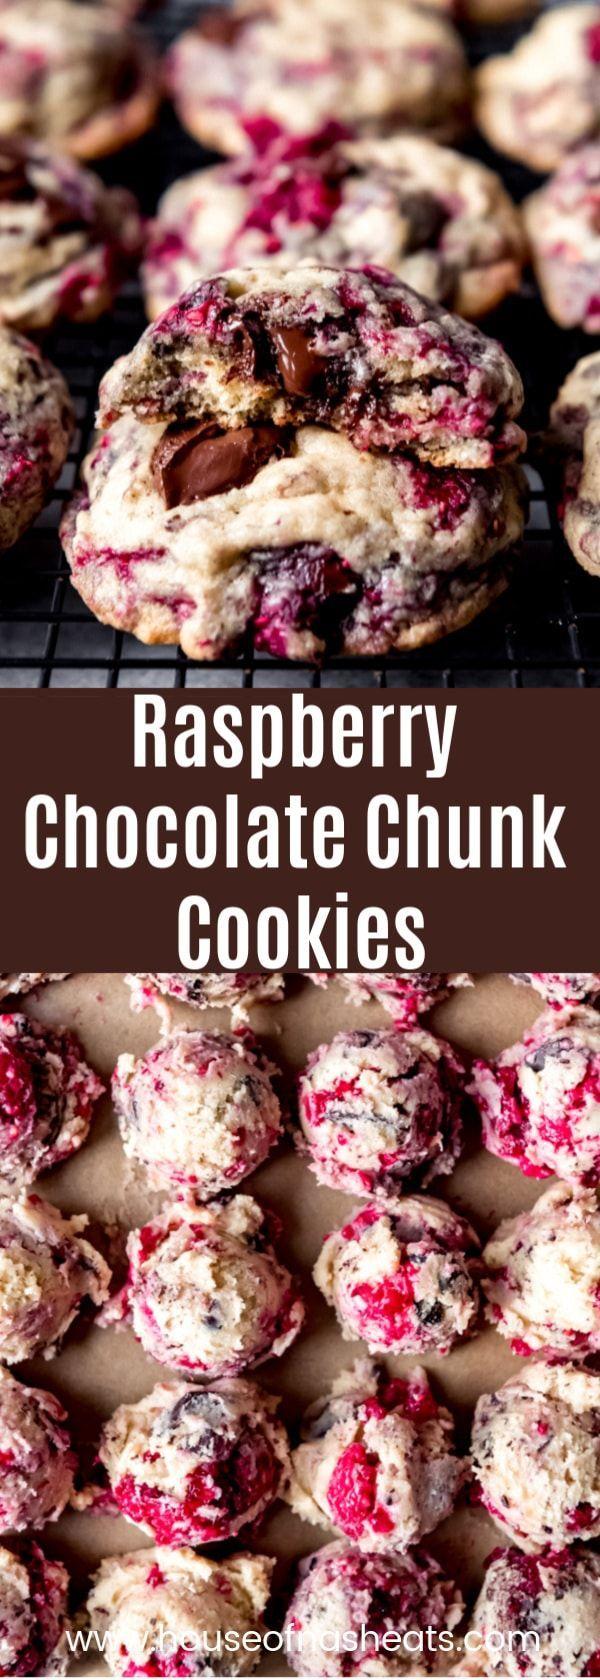 Raspberry Chocolate Chunk Cookies - House of Nash Eats